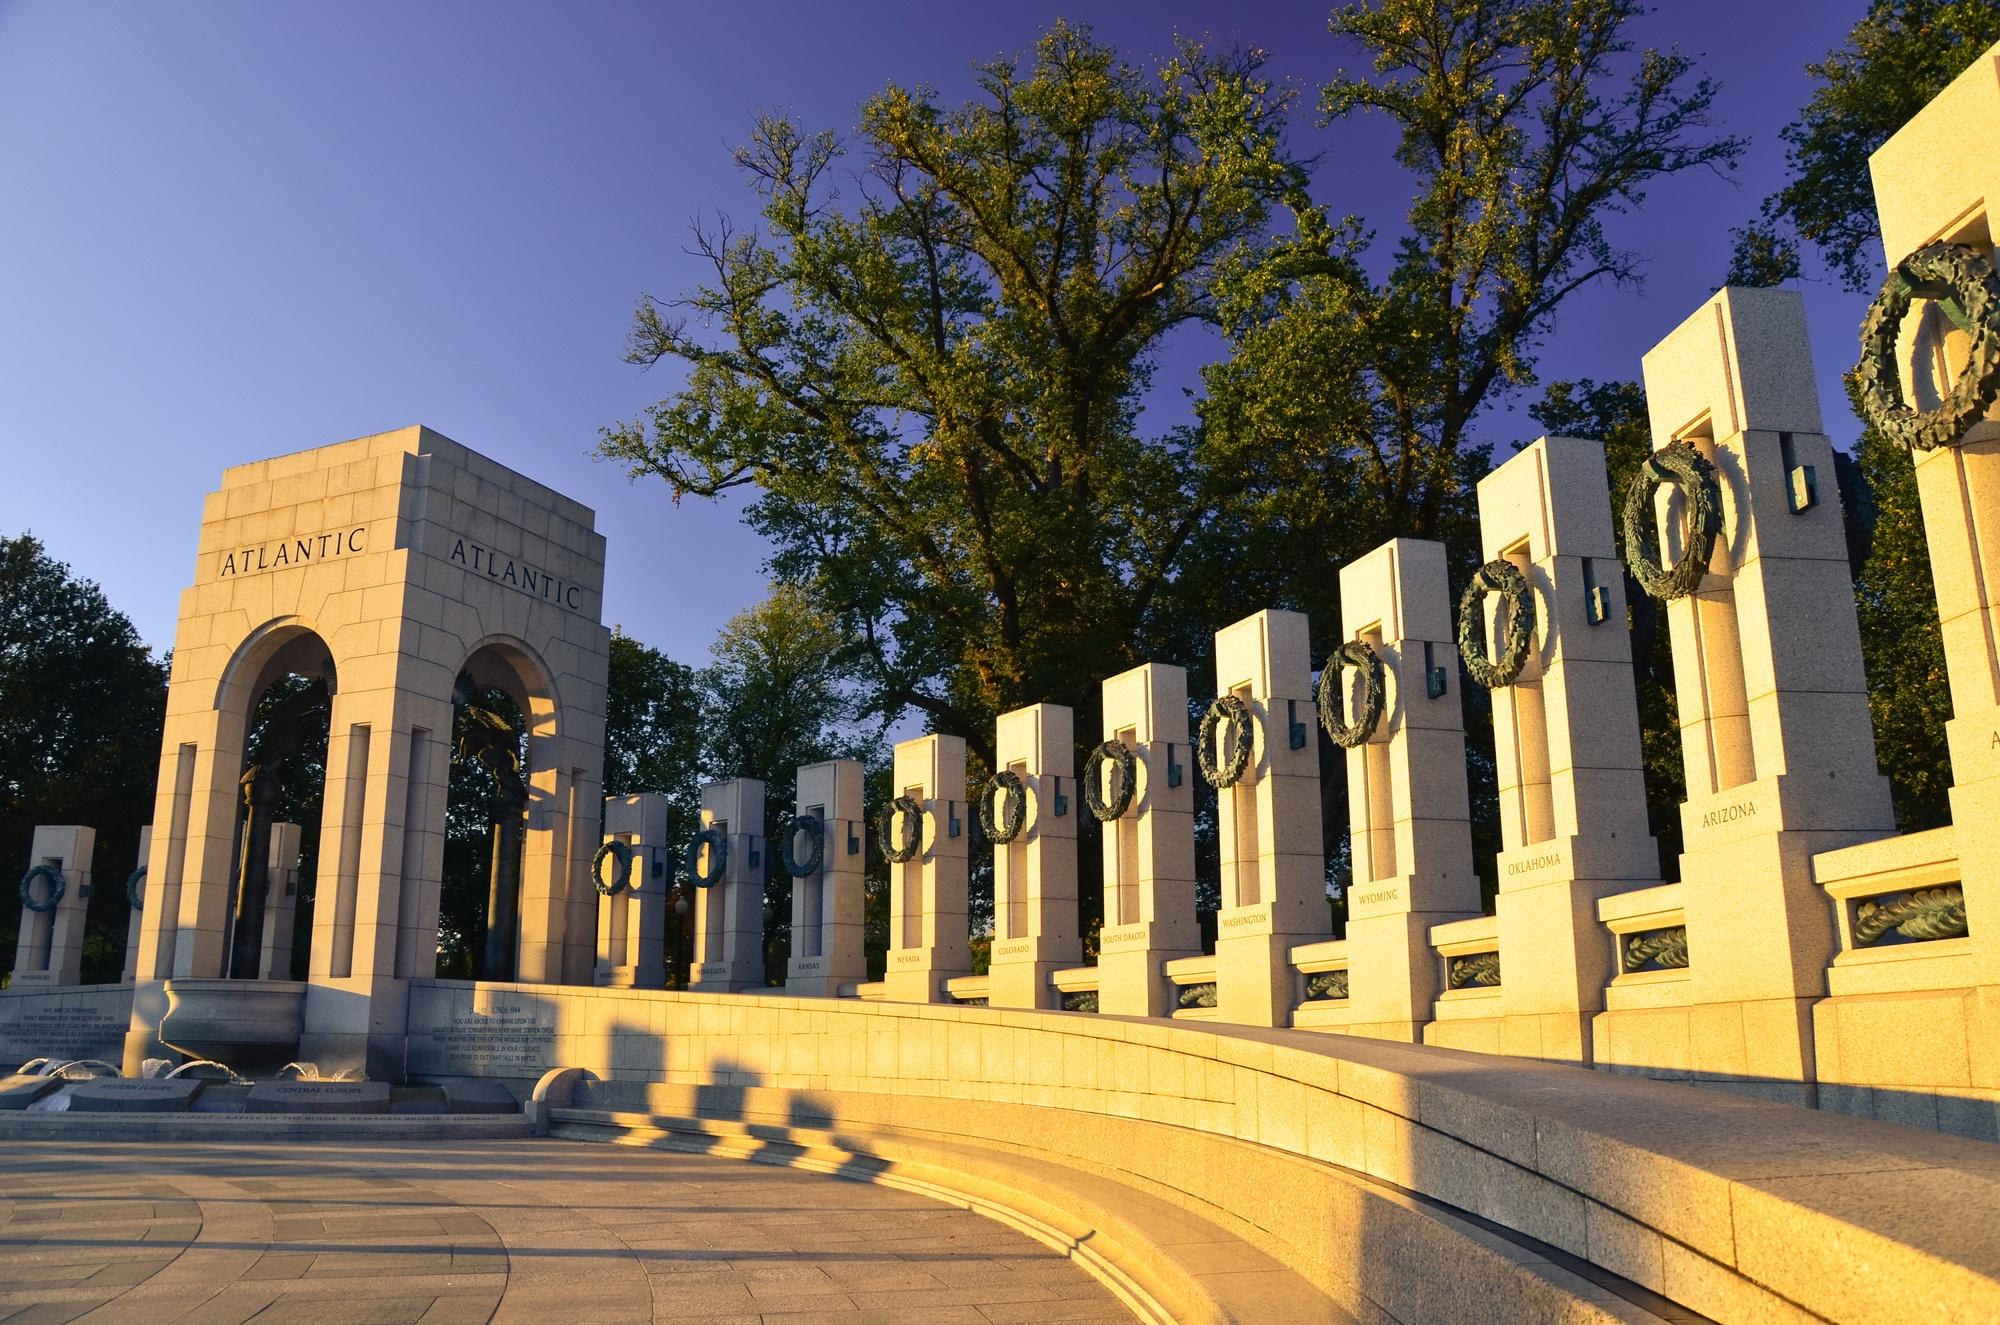 World War II Memorial in Washington D.C.